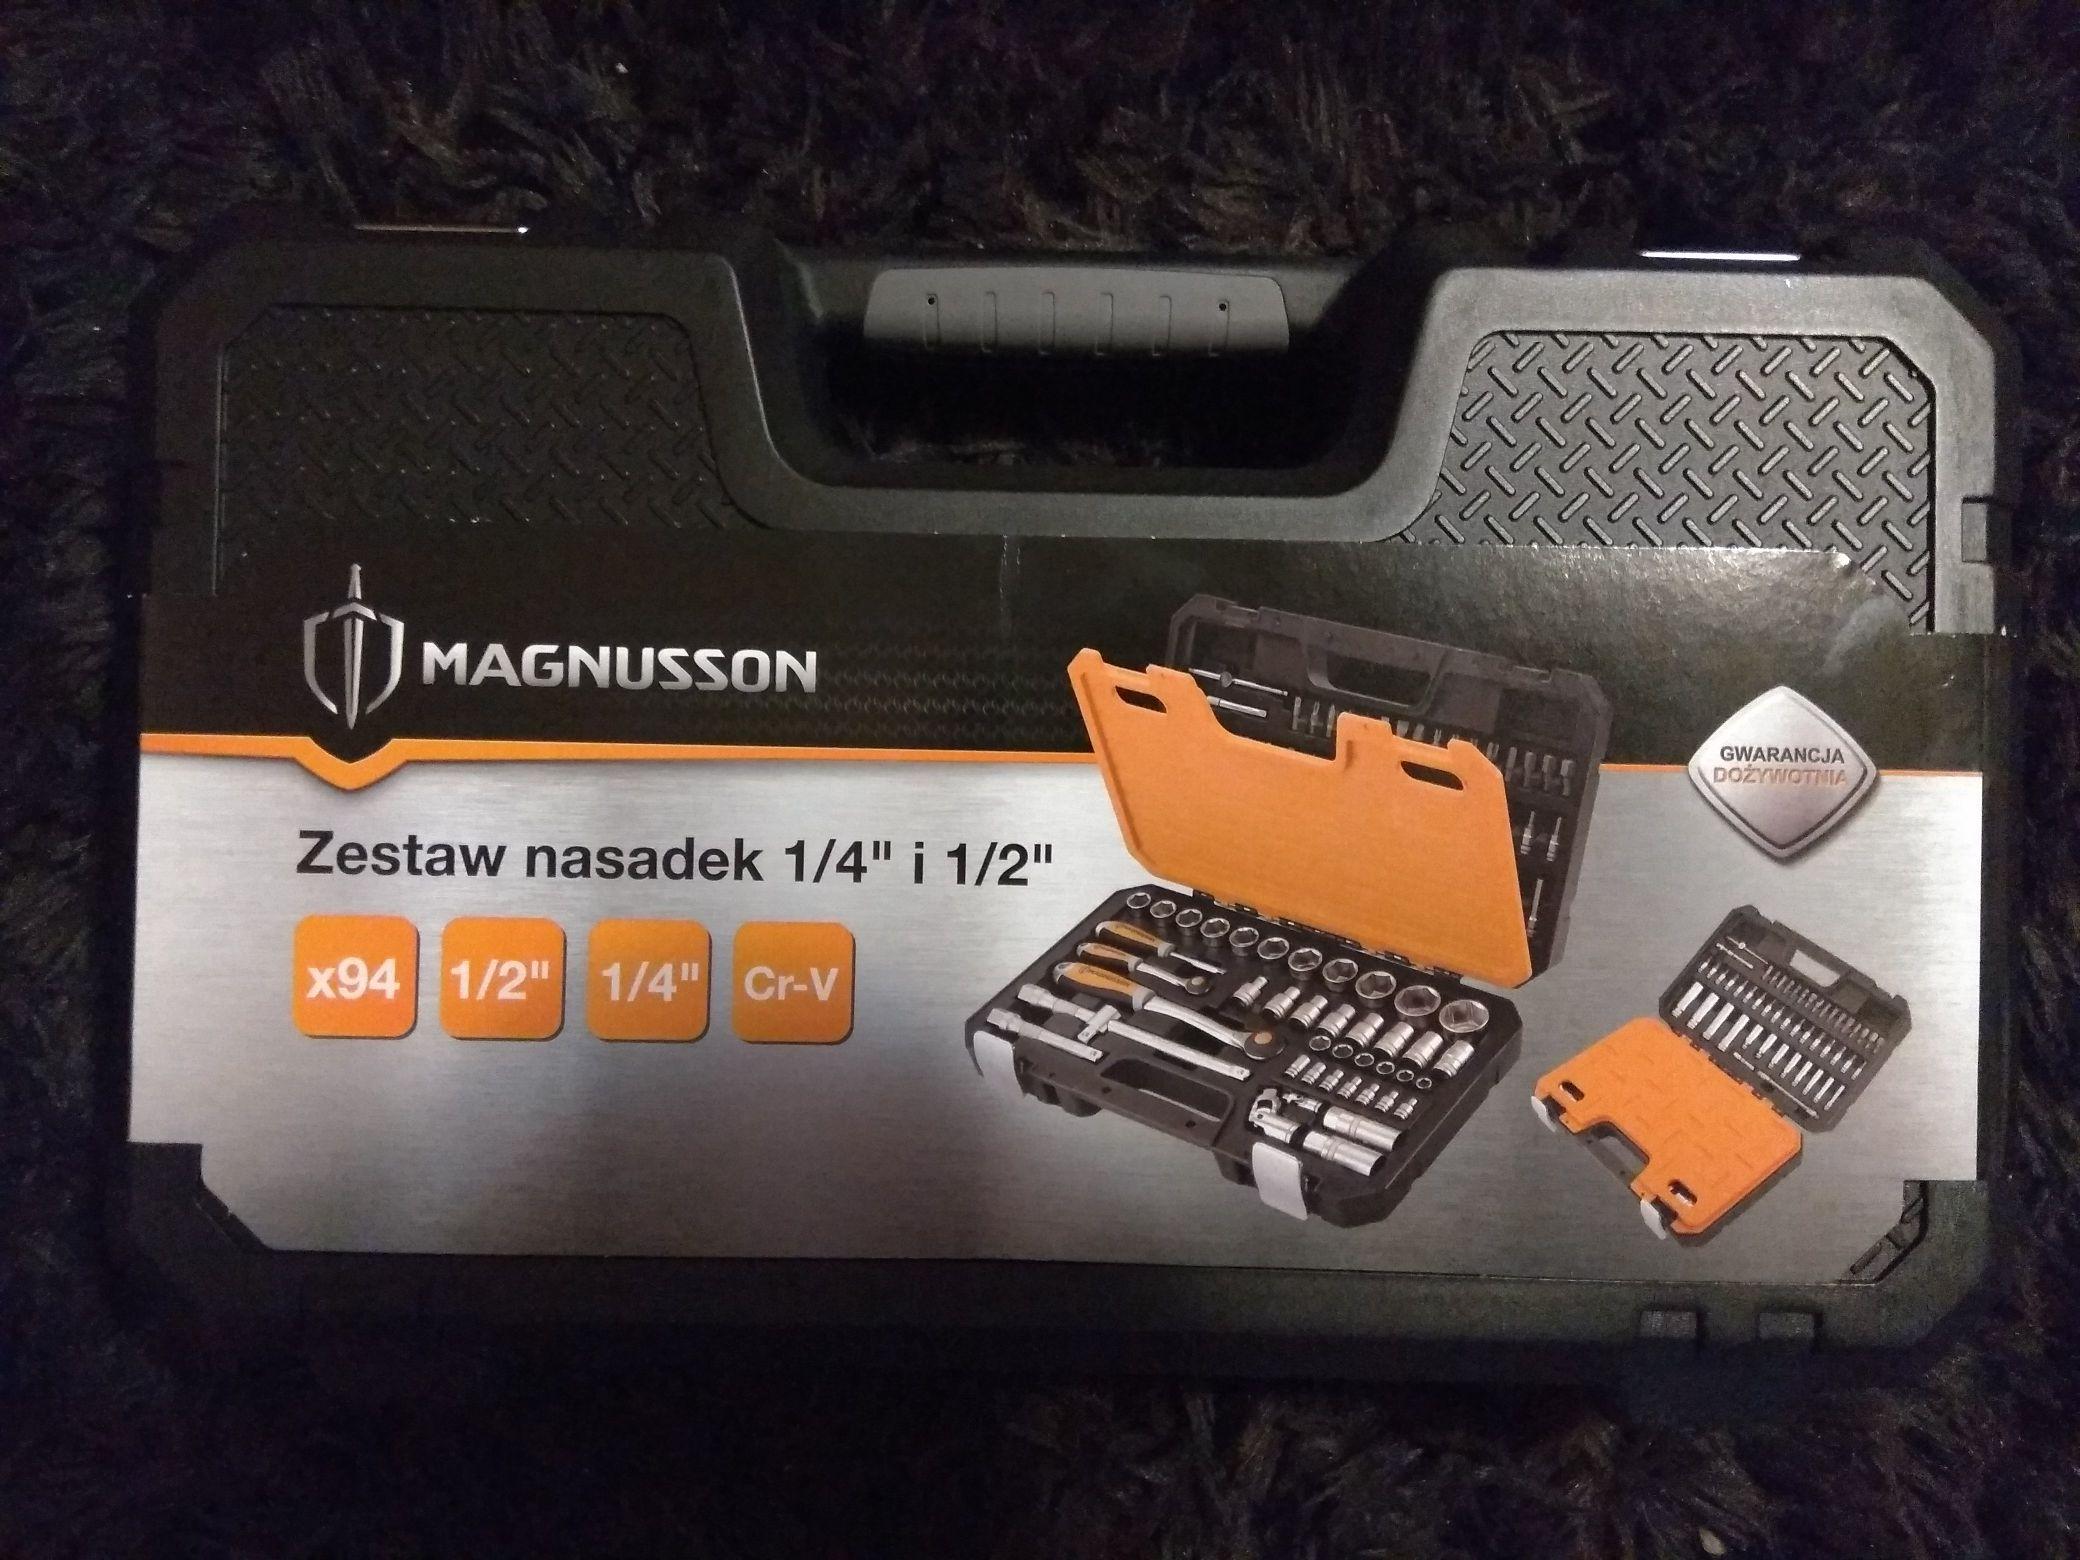 94-elementowy zestaw Magnusson